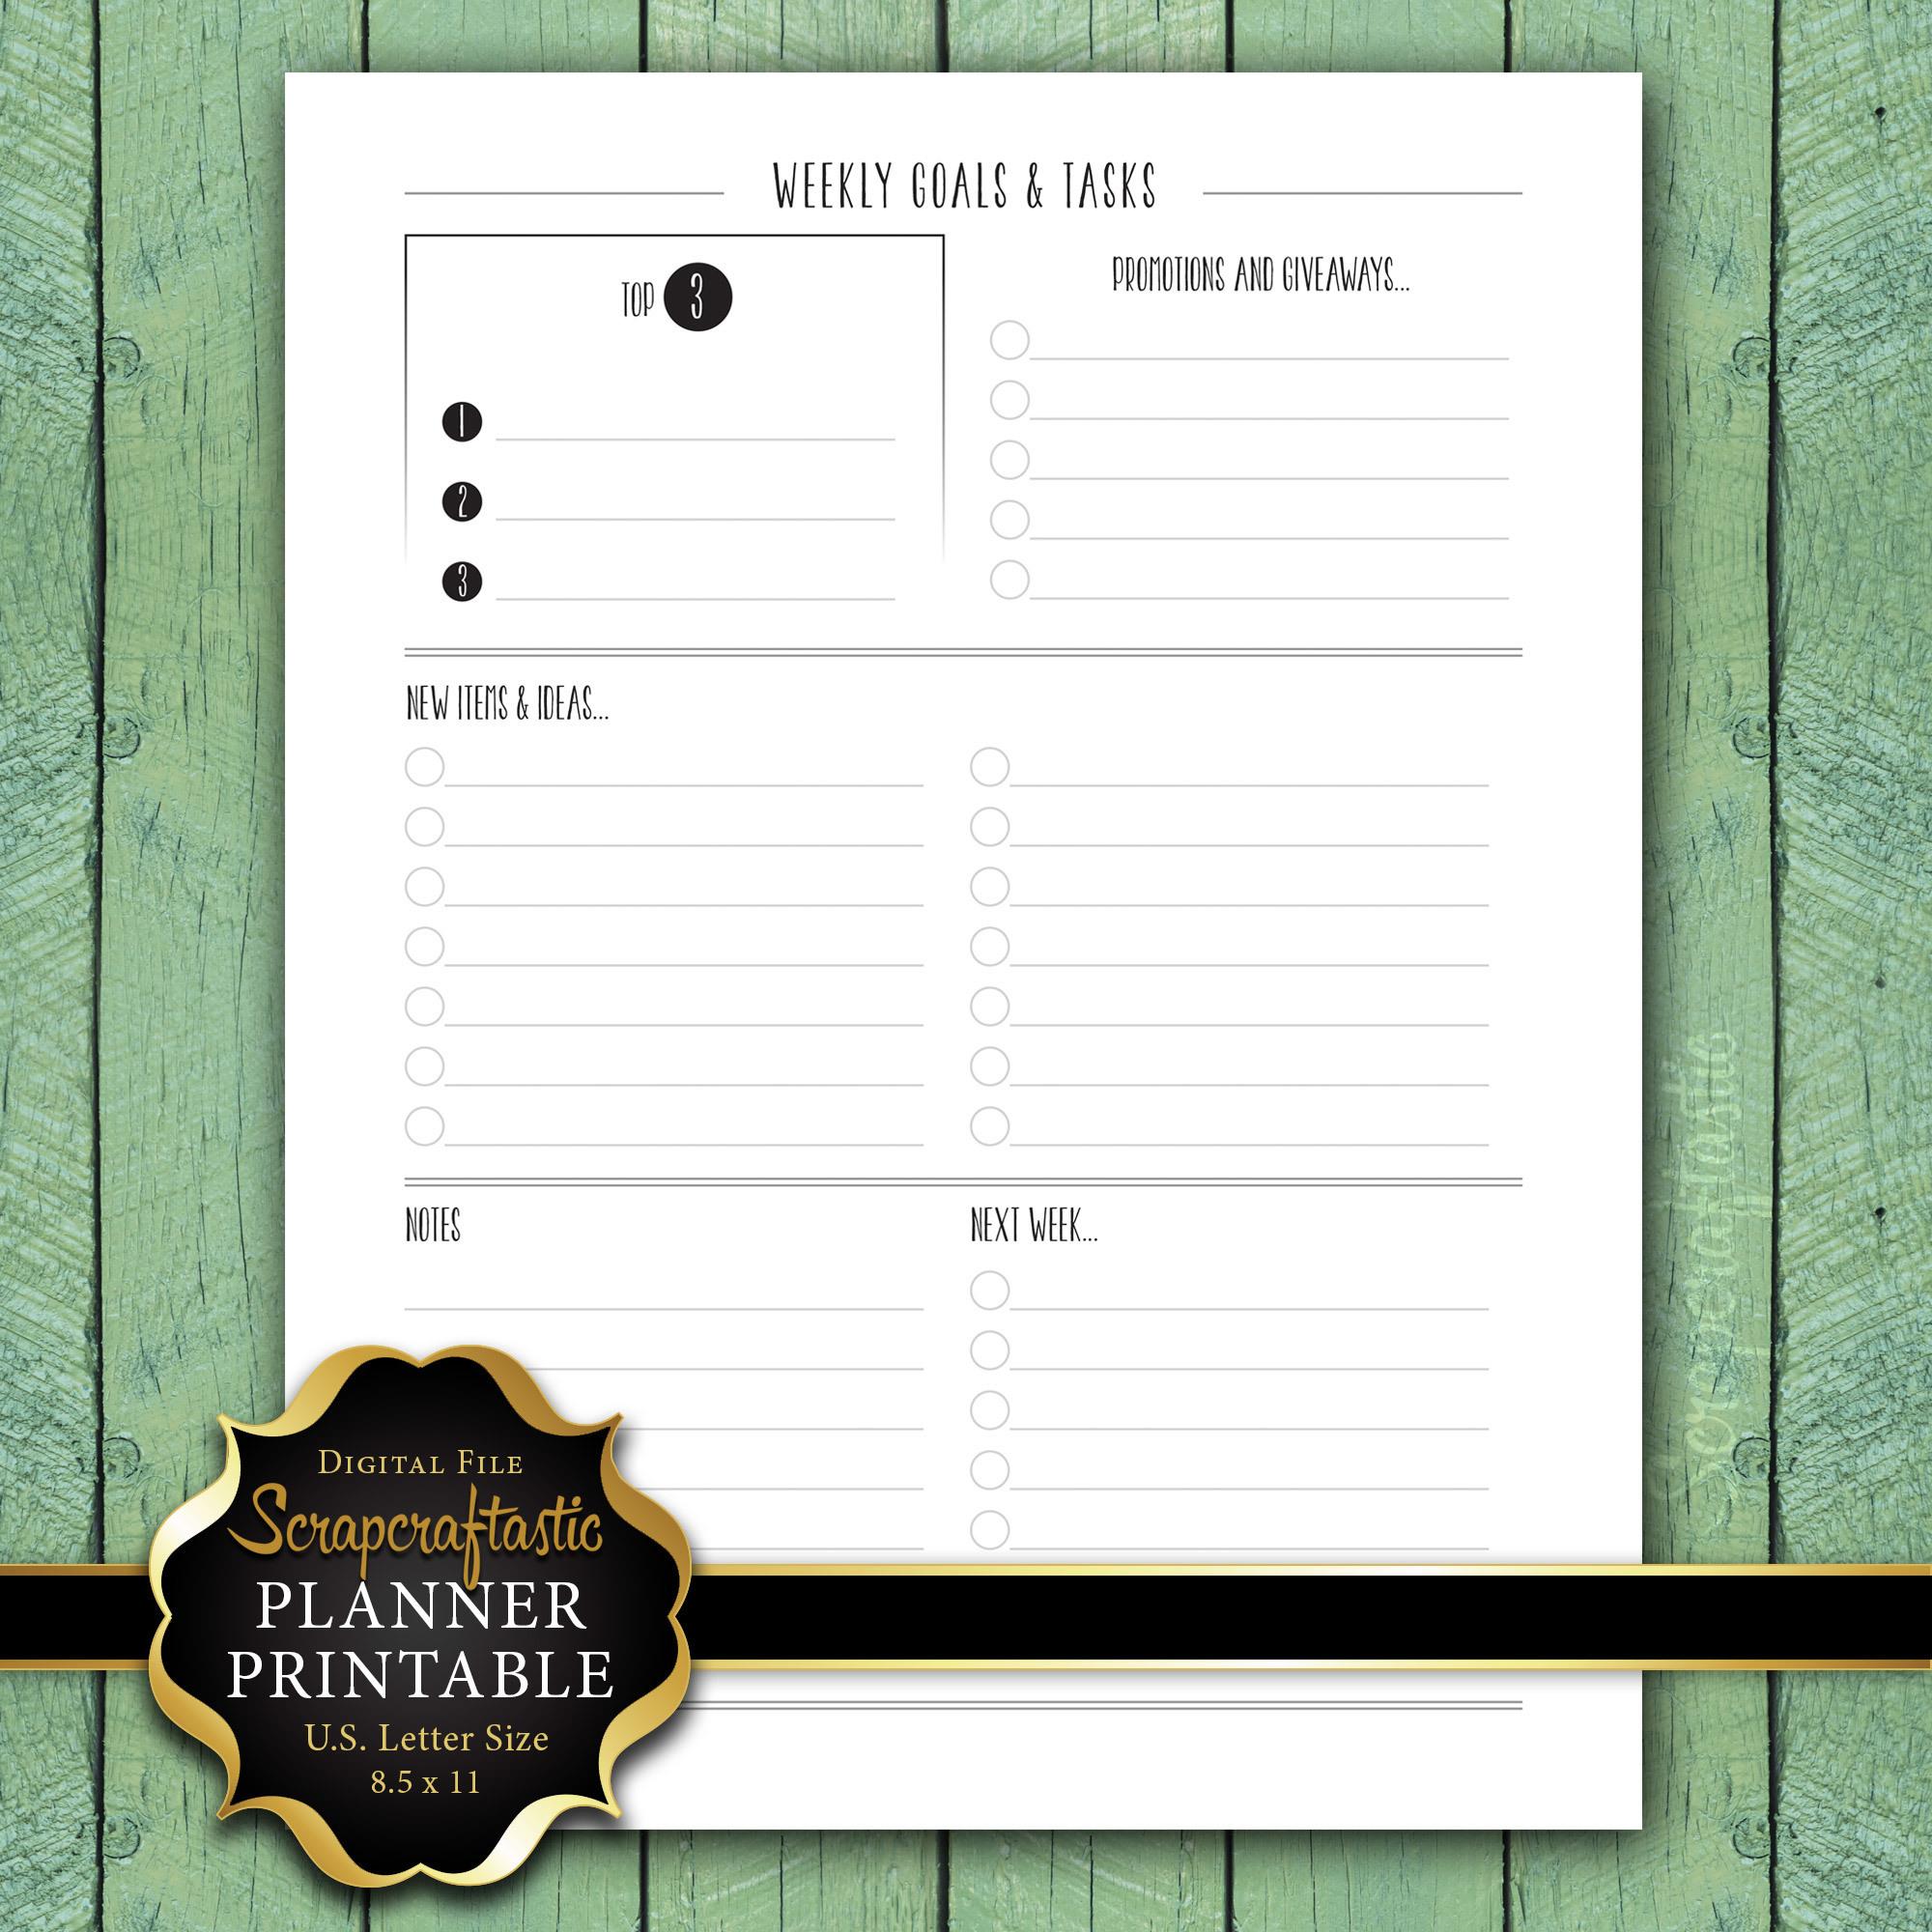 Weekly Goals & Tasks Letter Size Planner Printable Insert dbr_ltr_weeklyshopgoals